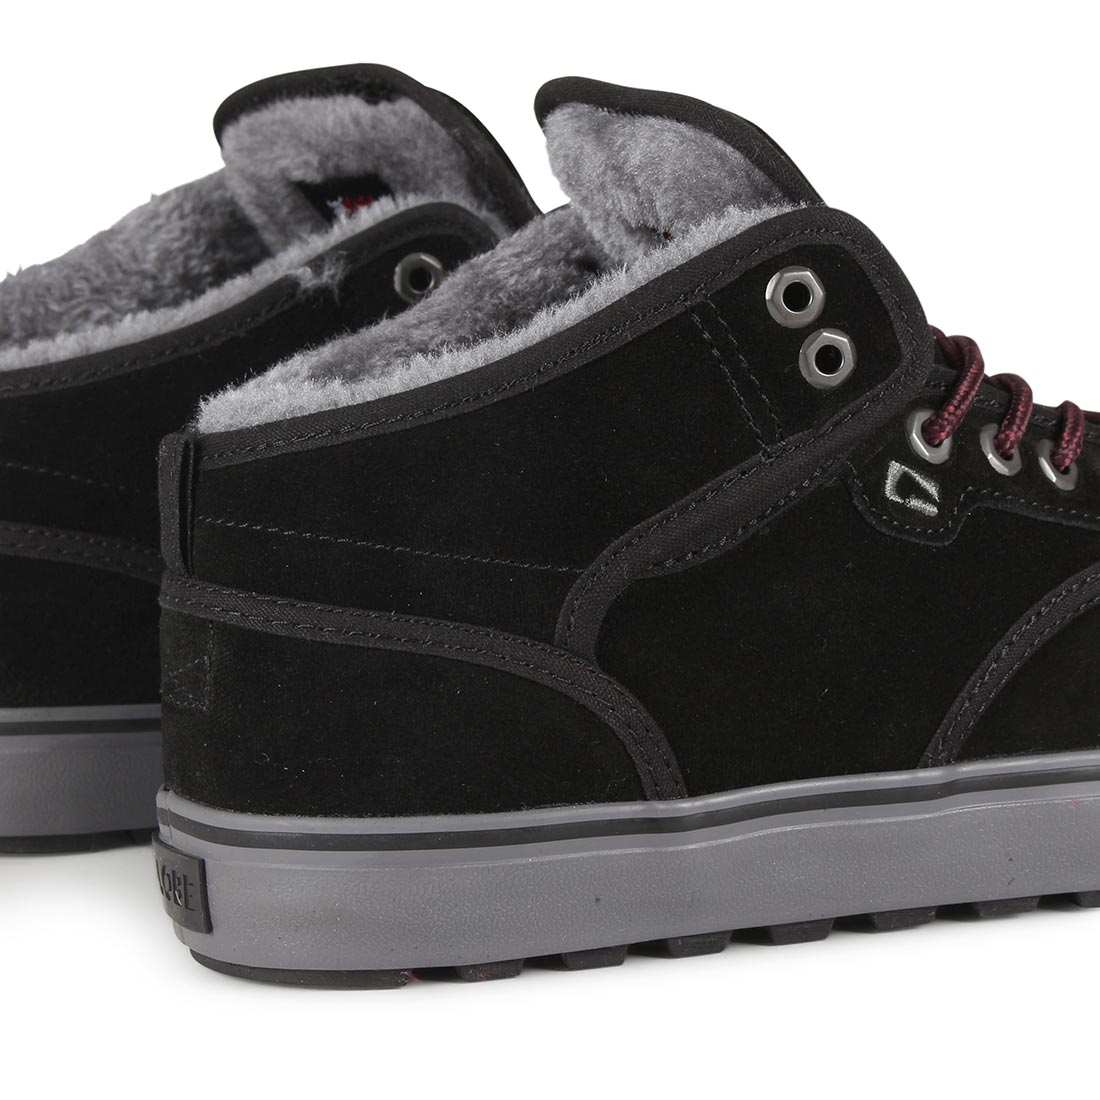 0e675395d43 Globe Motley Mid Shoes - Black / Phantom / Fur